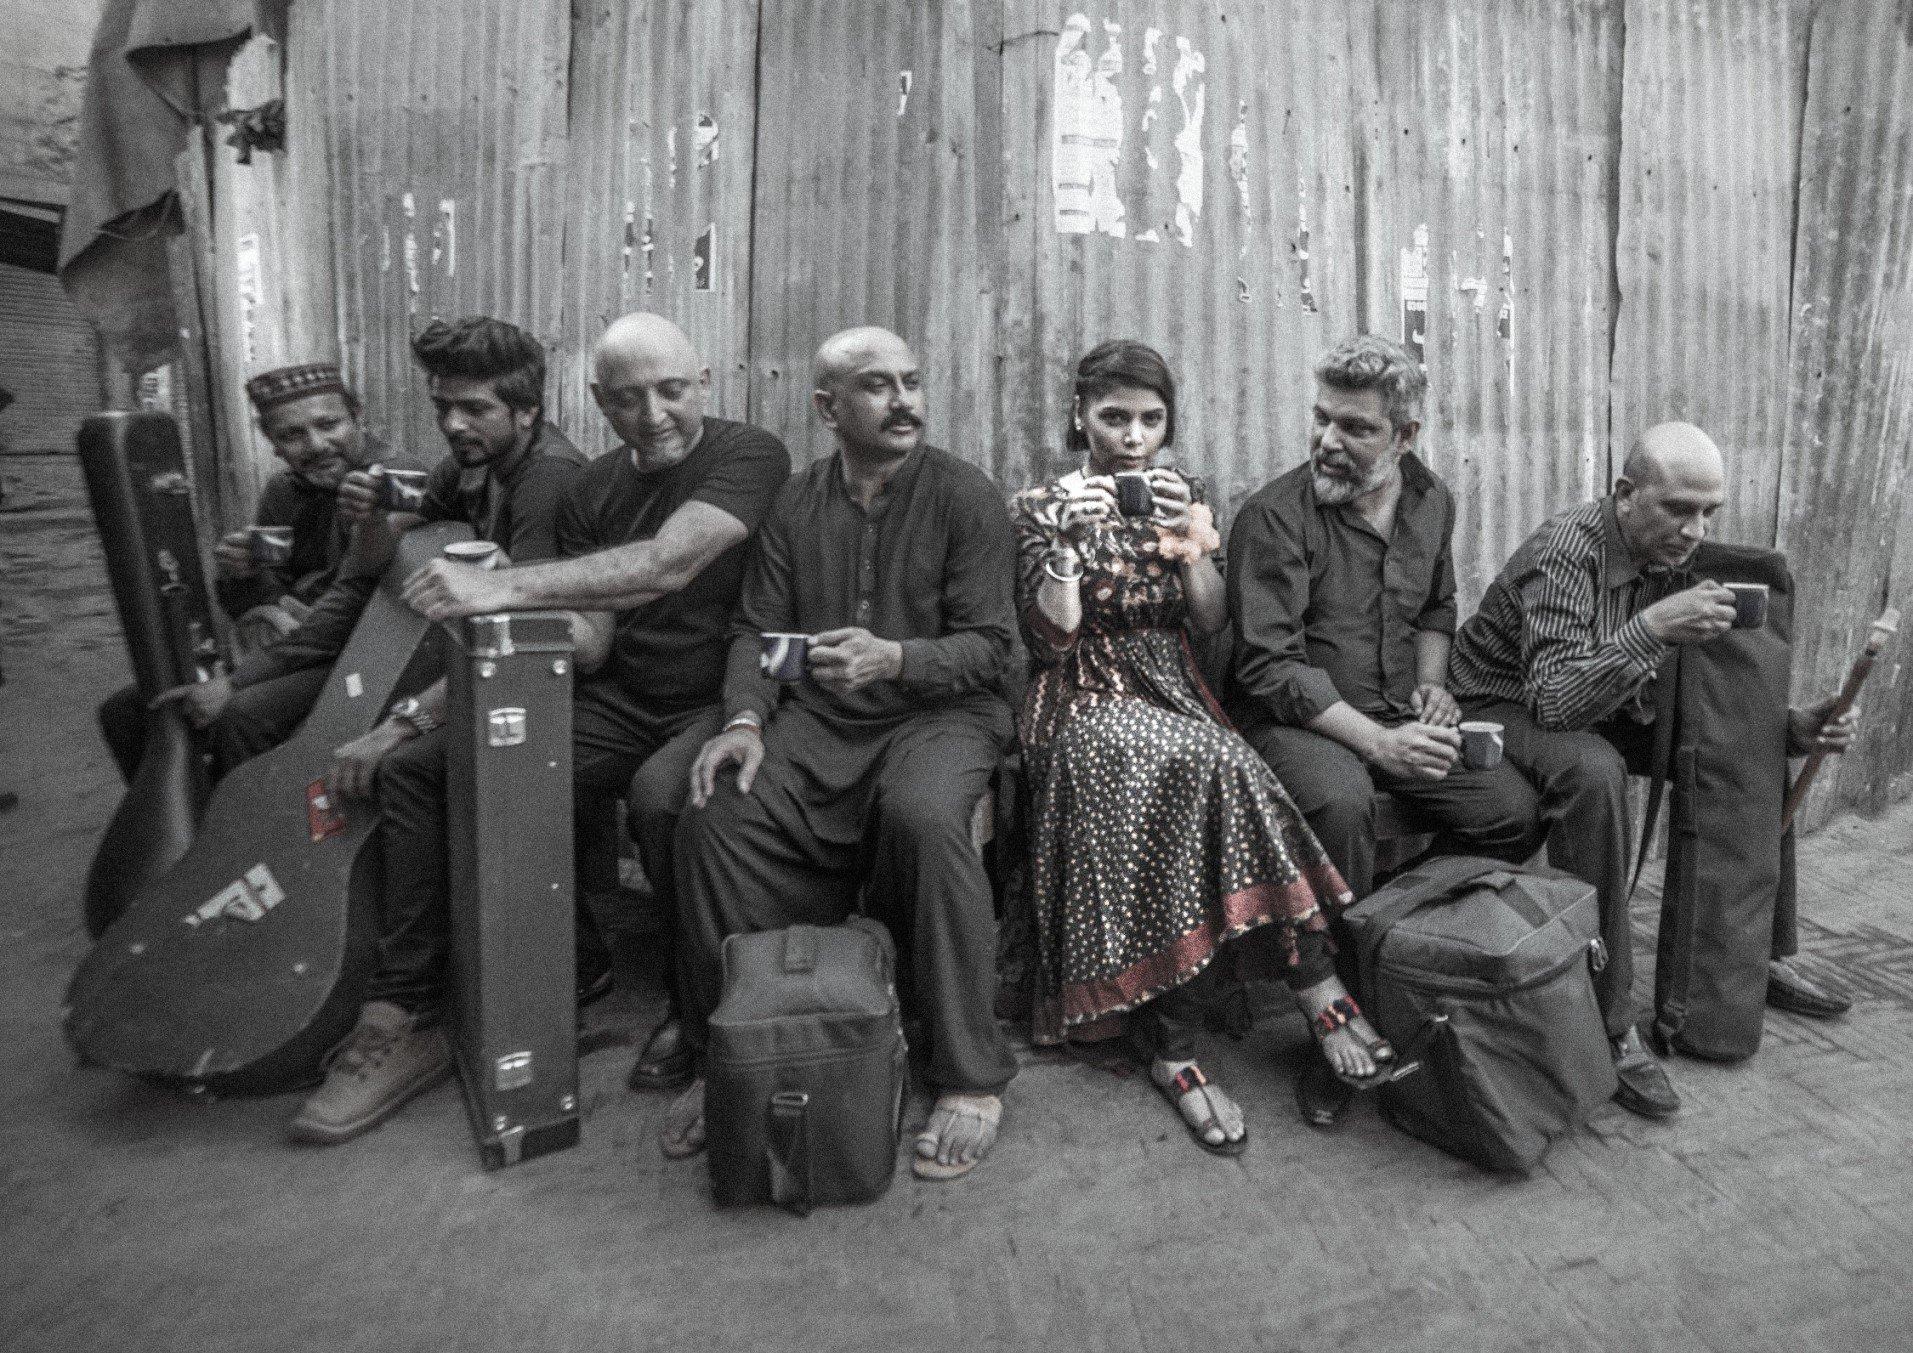 Hadiqa Kiani is all set to release her new music album